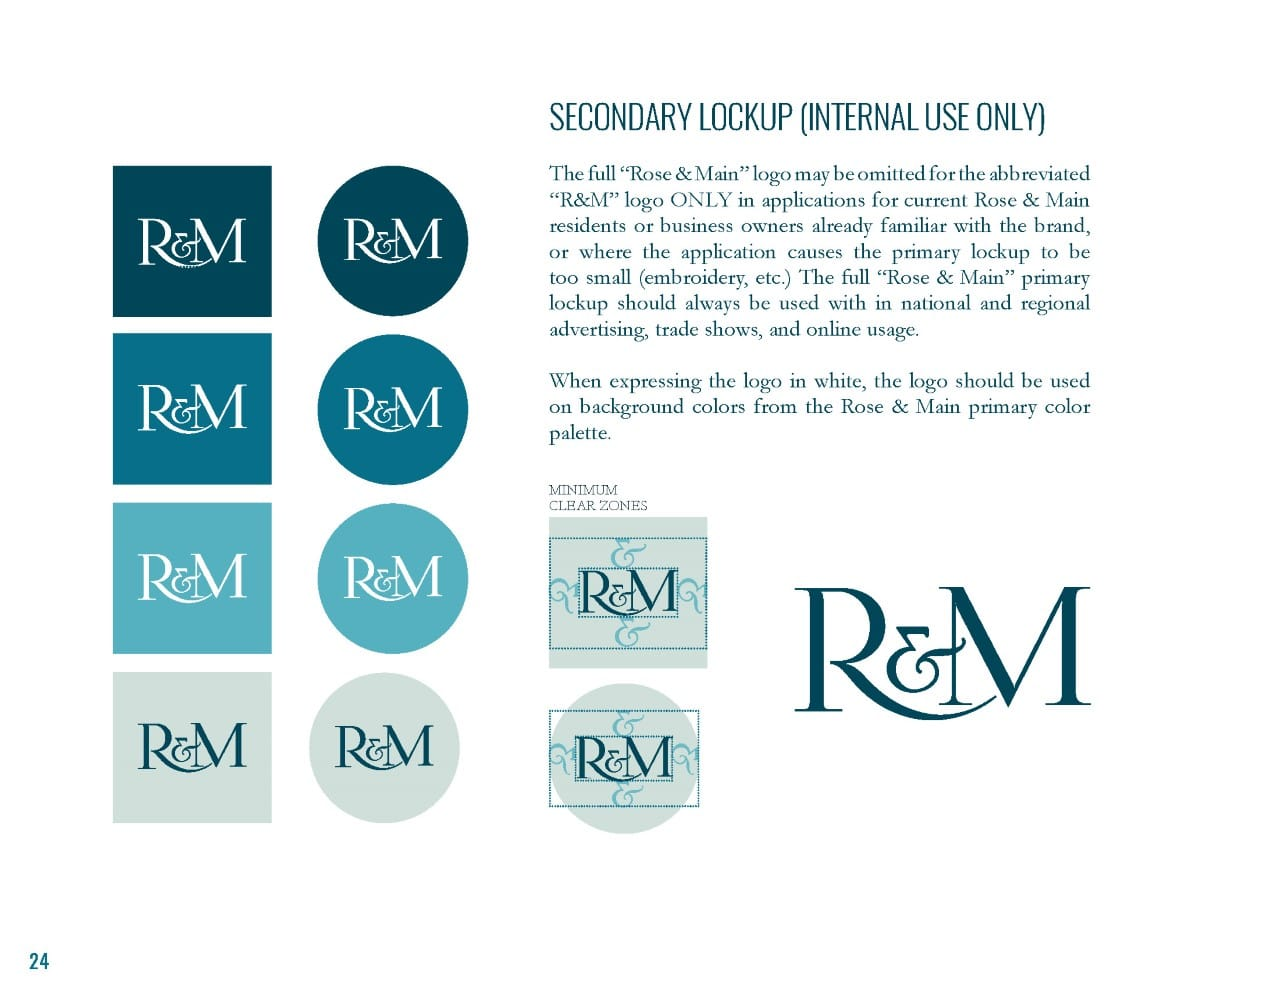 Rose & Main Brand Standards - Place Based Branding Secondary Logo